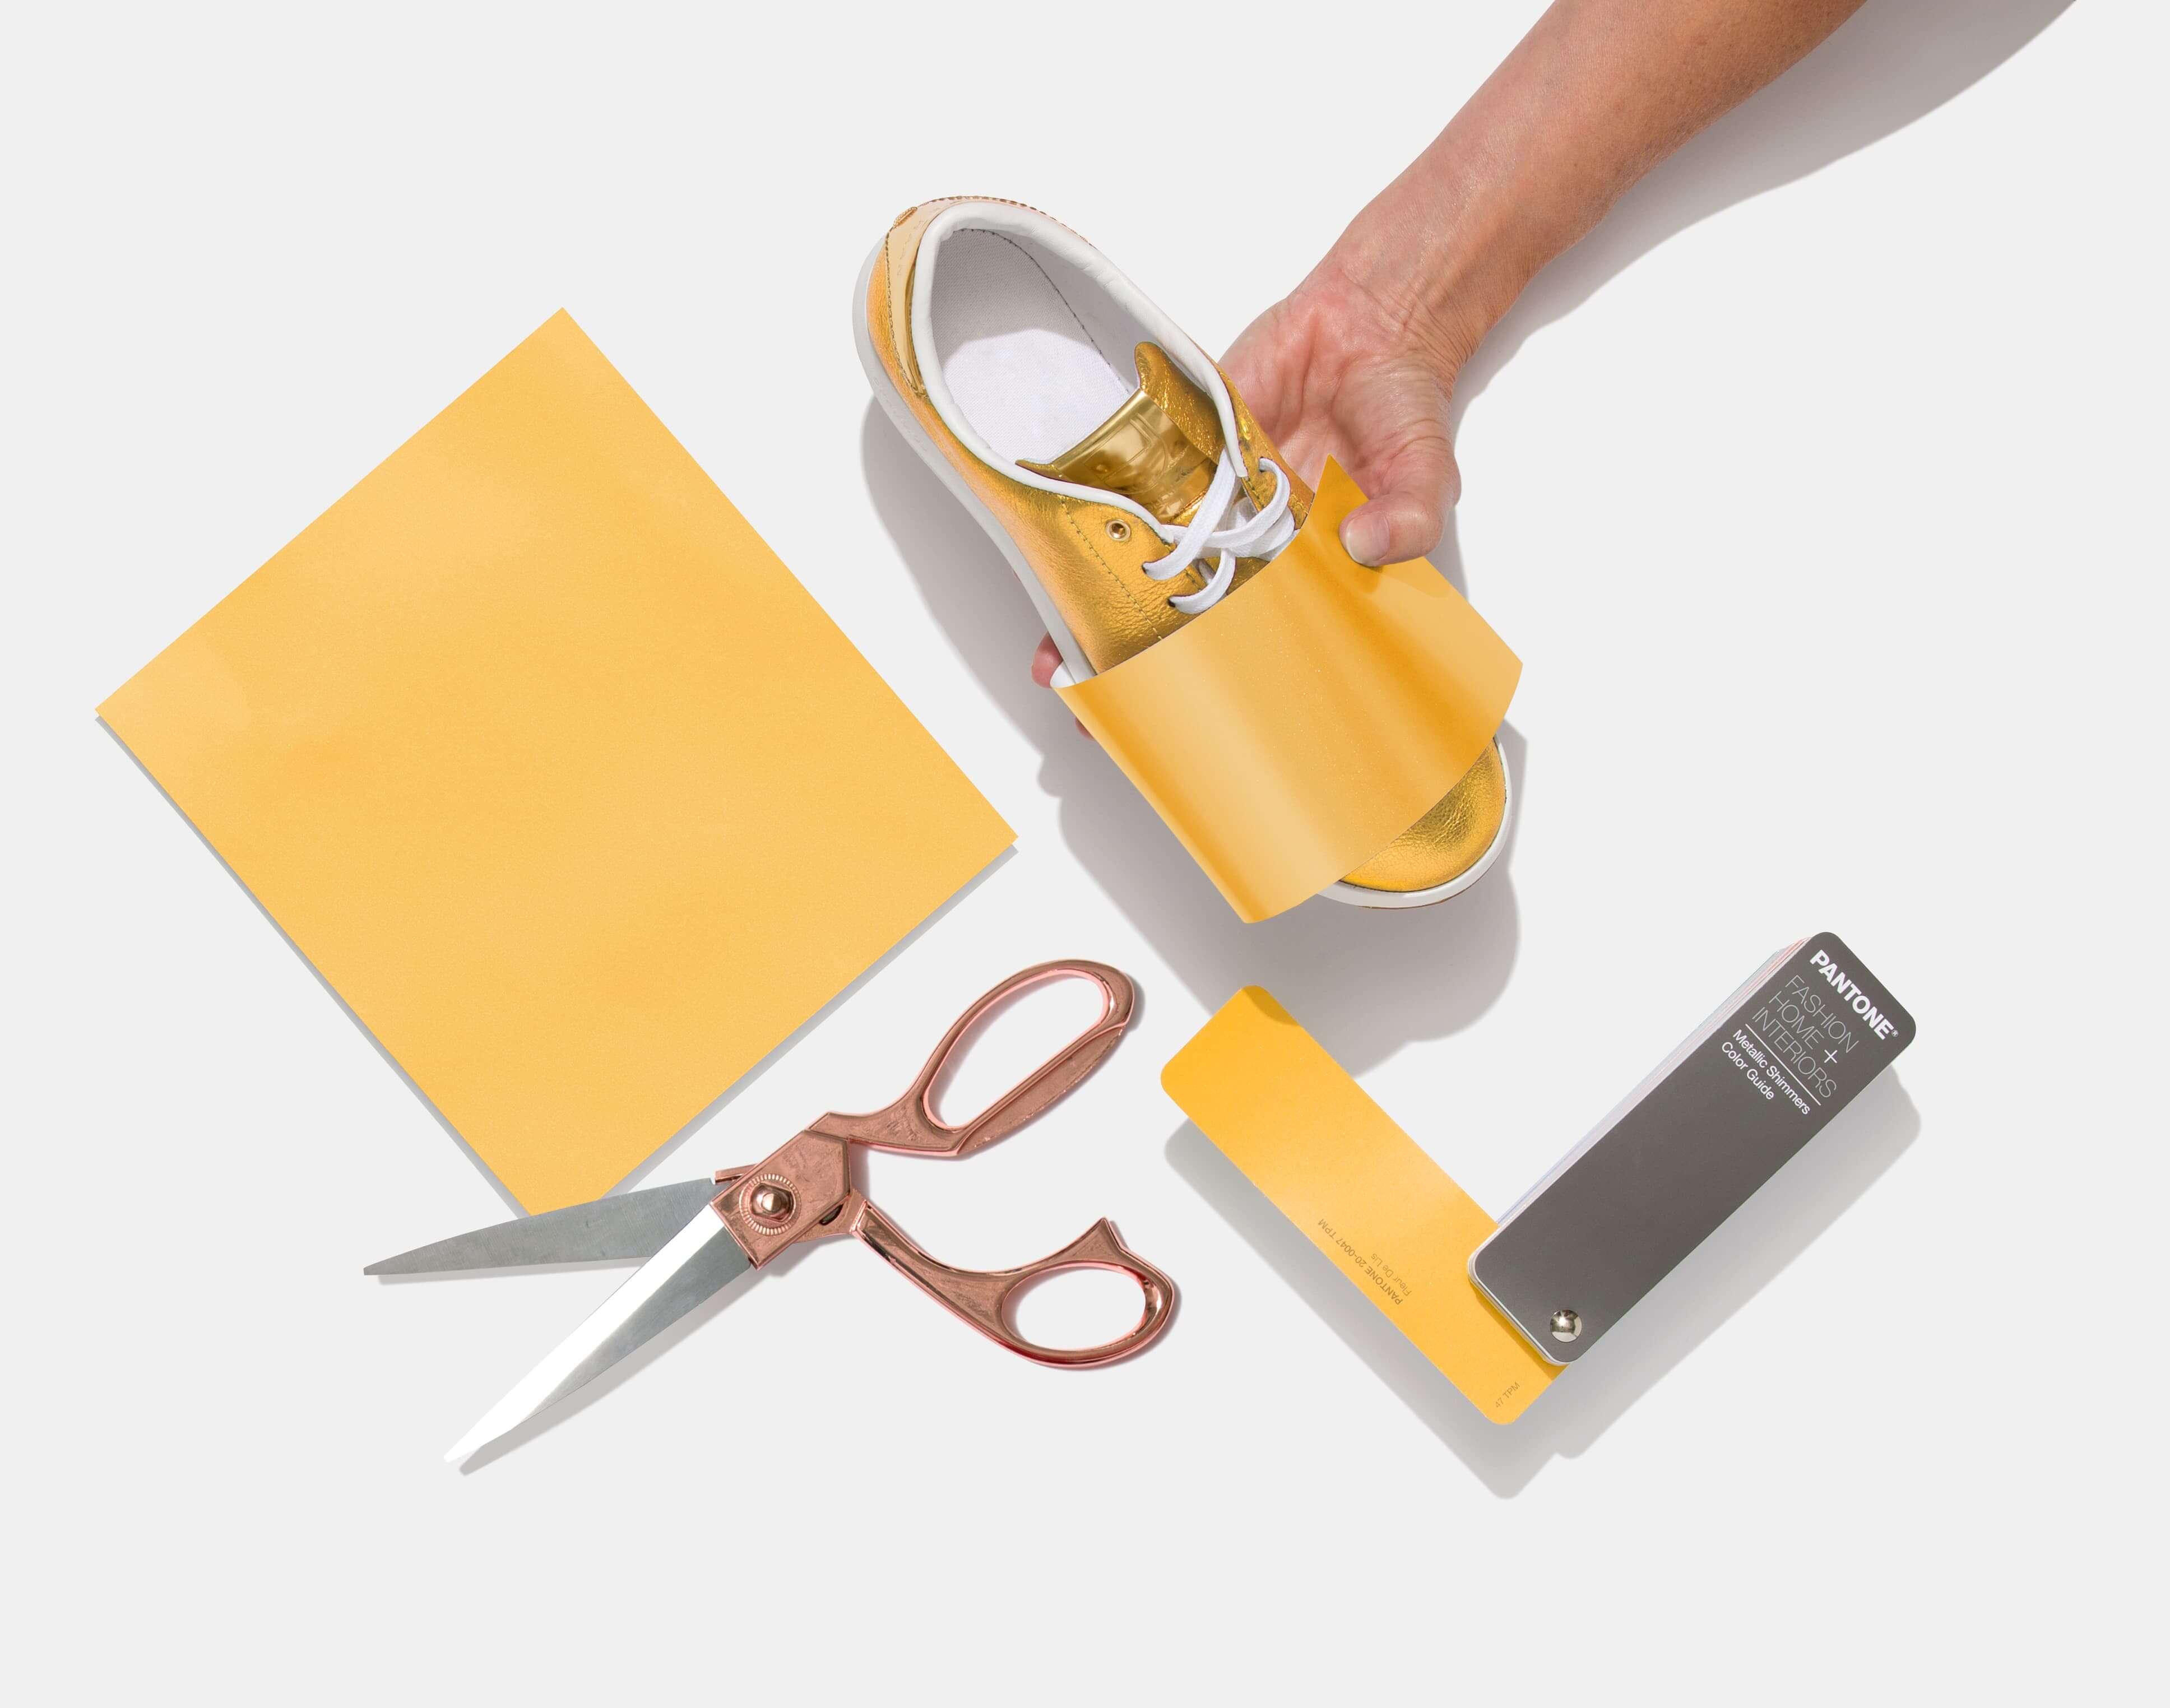 Pantone Metallic Shimmers Color Guide for footwear design